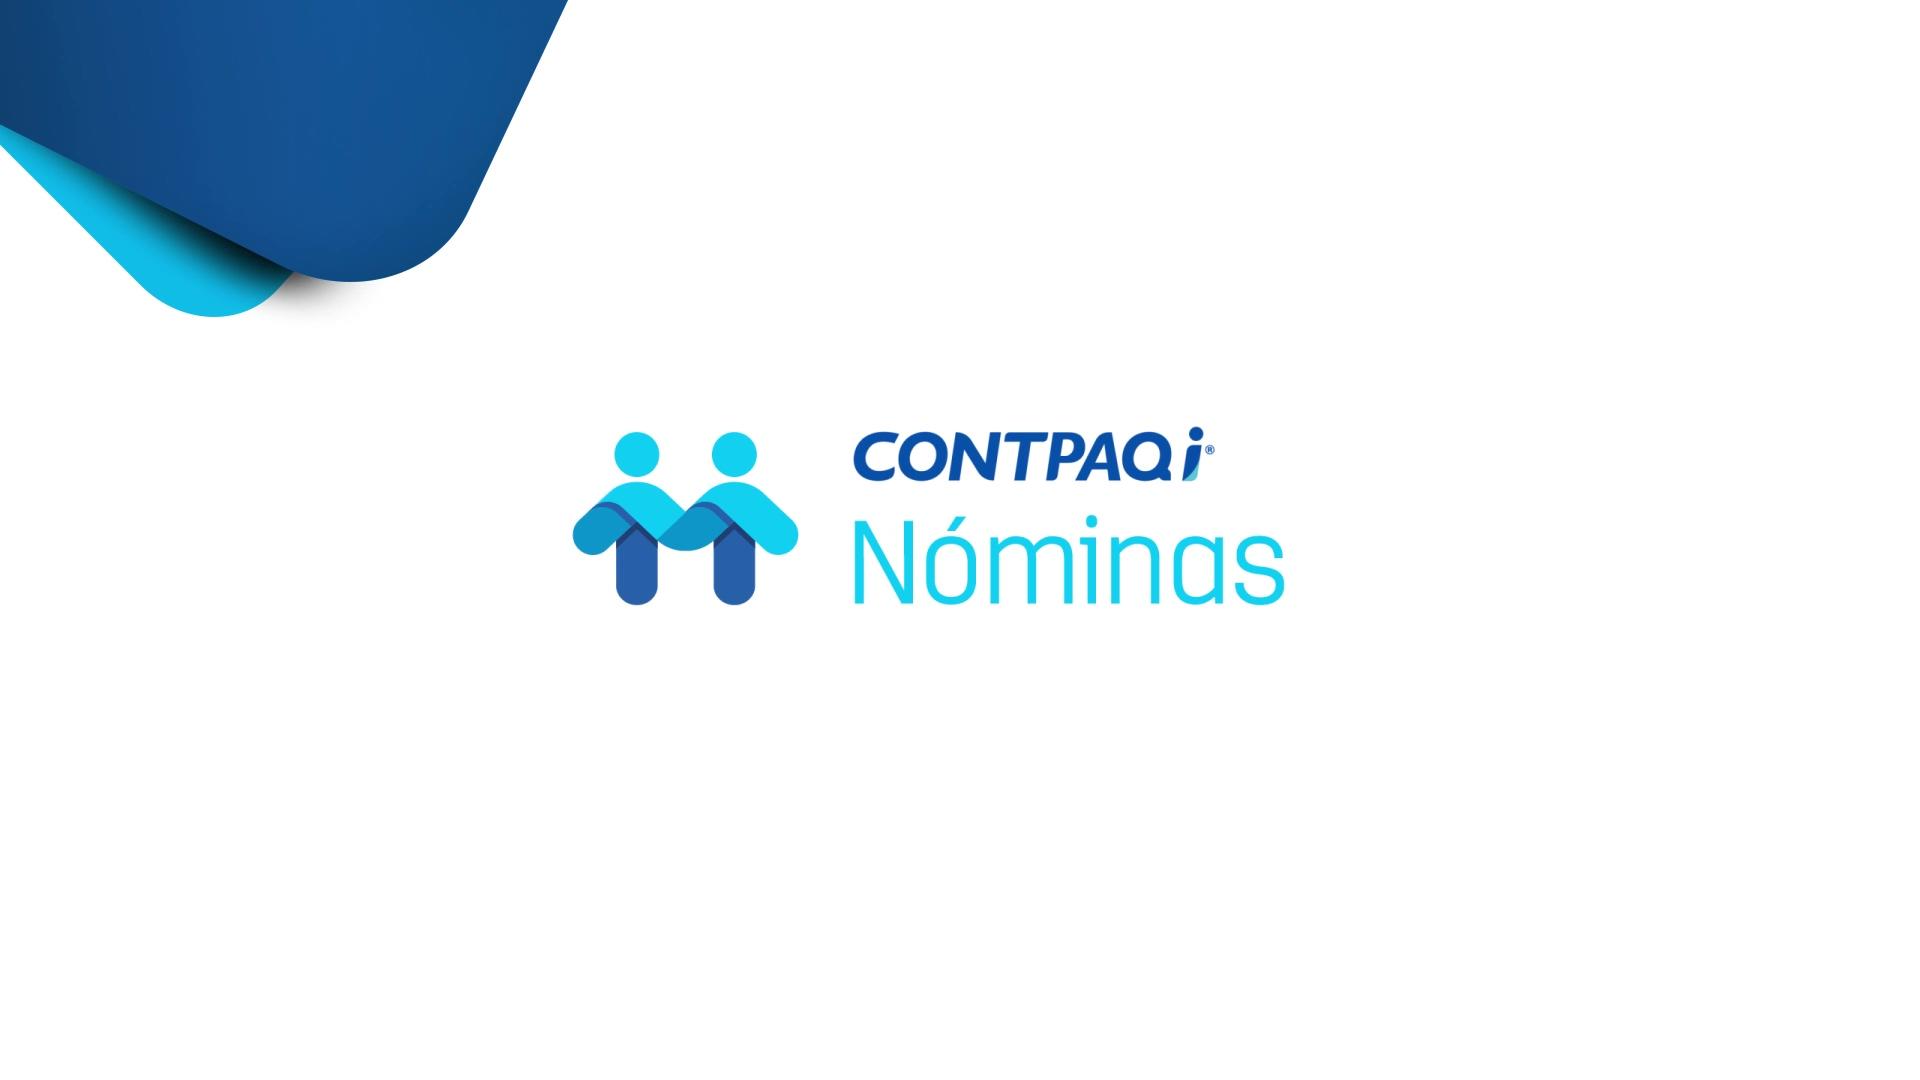 Contpaqi_ADemo-Nominas_2020